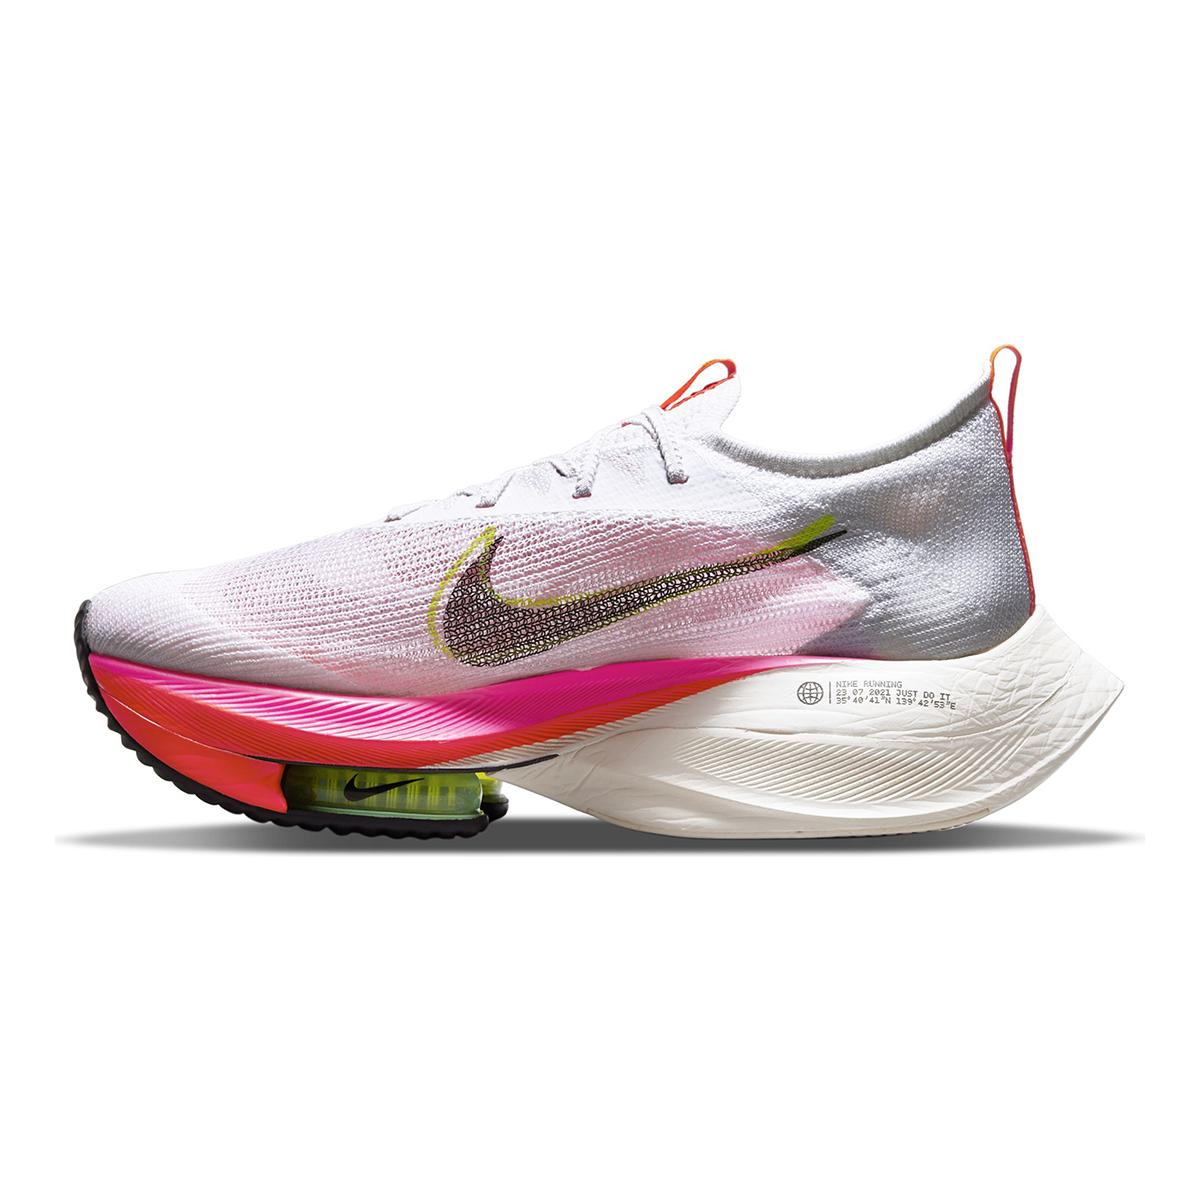 Men's Nike Air Zoom Alphafly Next% Flyknit Running Shoe - Color: Rawdacious - Size: 6 - Width: Regular, Rawdacious, large, image 2